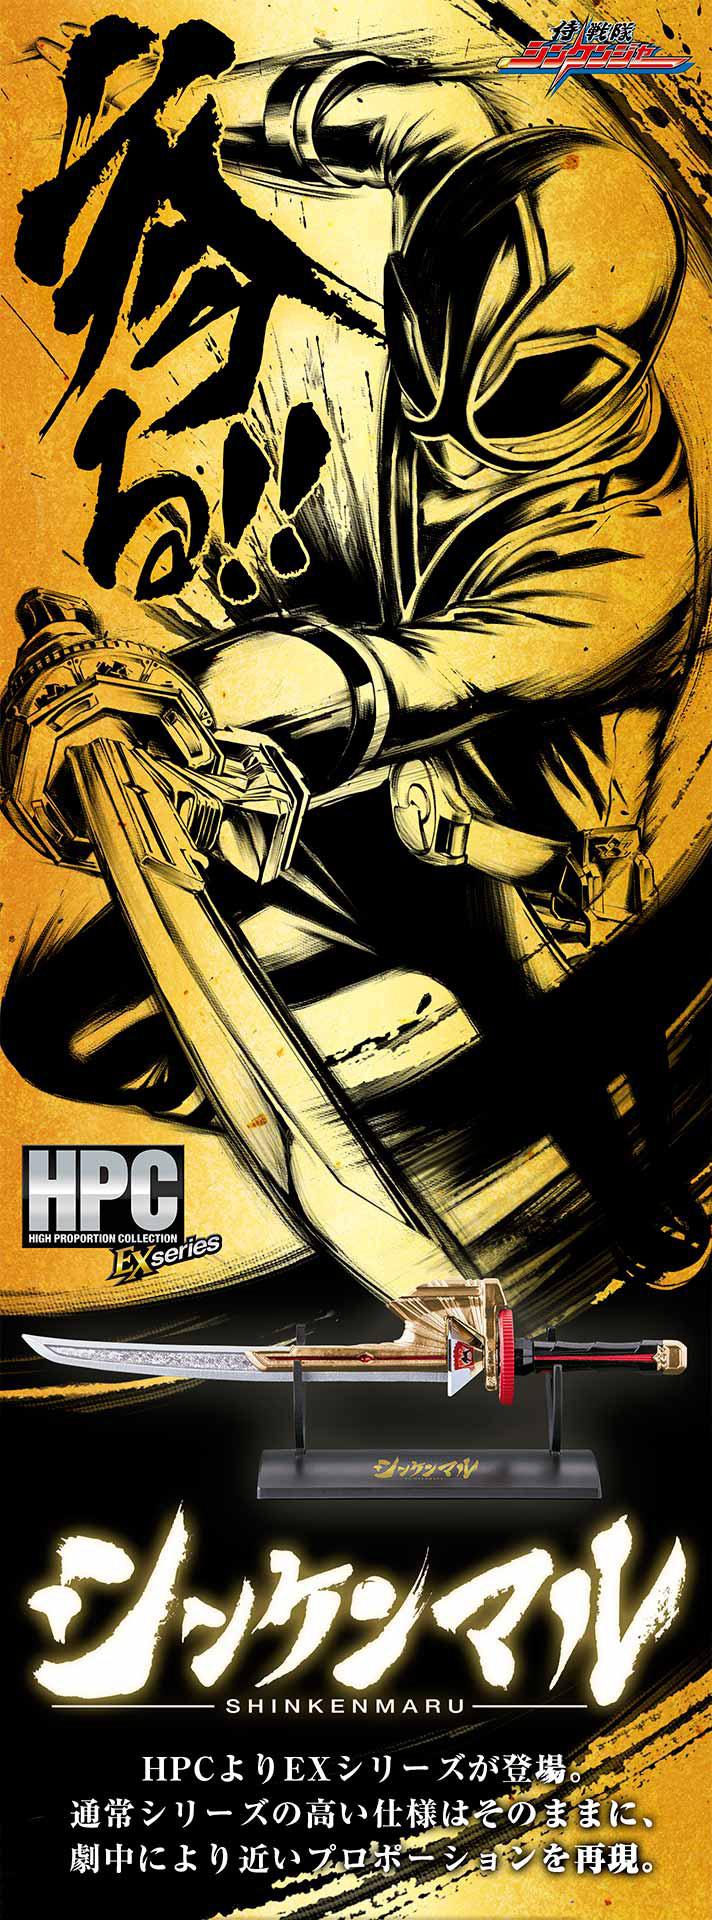 天下御免的侍戰隊・真劍者,參見!《侍戰隊真劍者》HPC EX series 真劍丸  シンケンマル